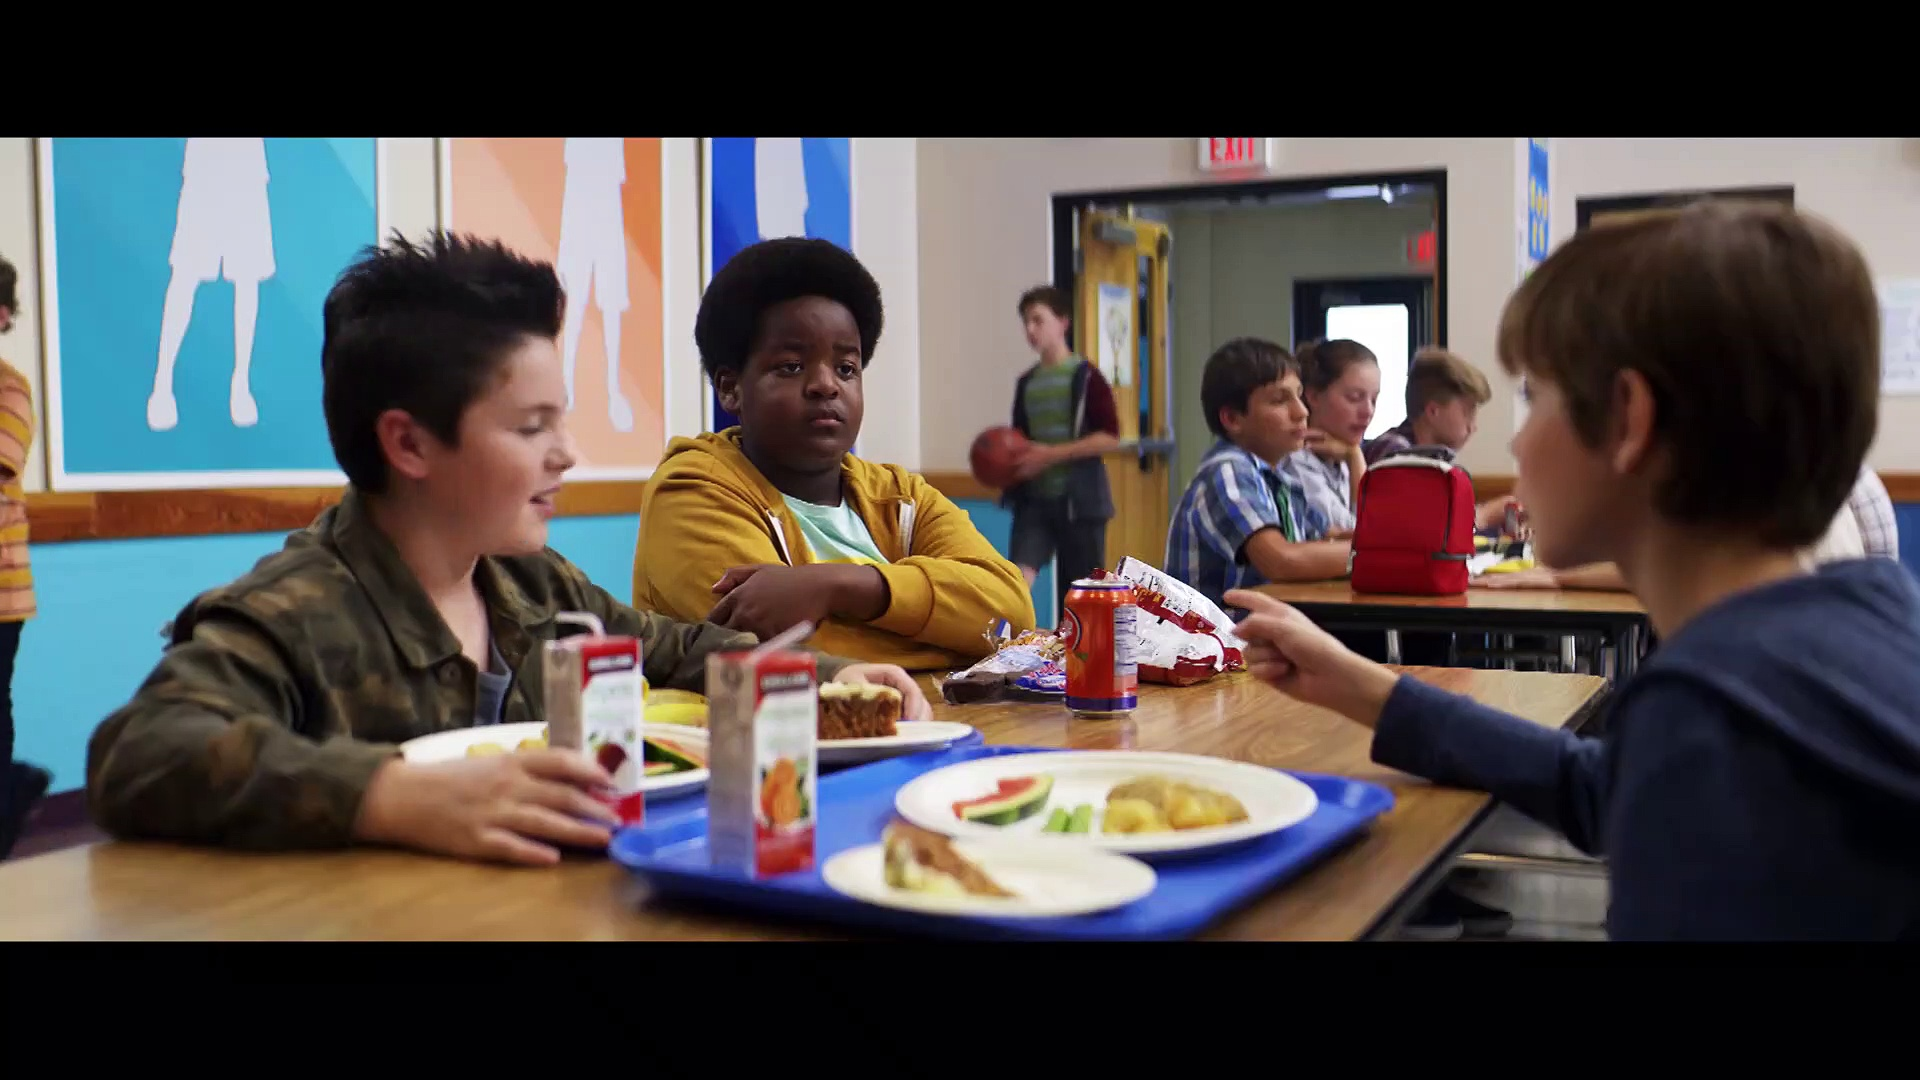 Movie Premiere: 'Good Boys'